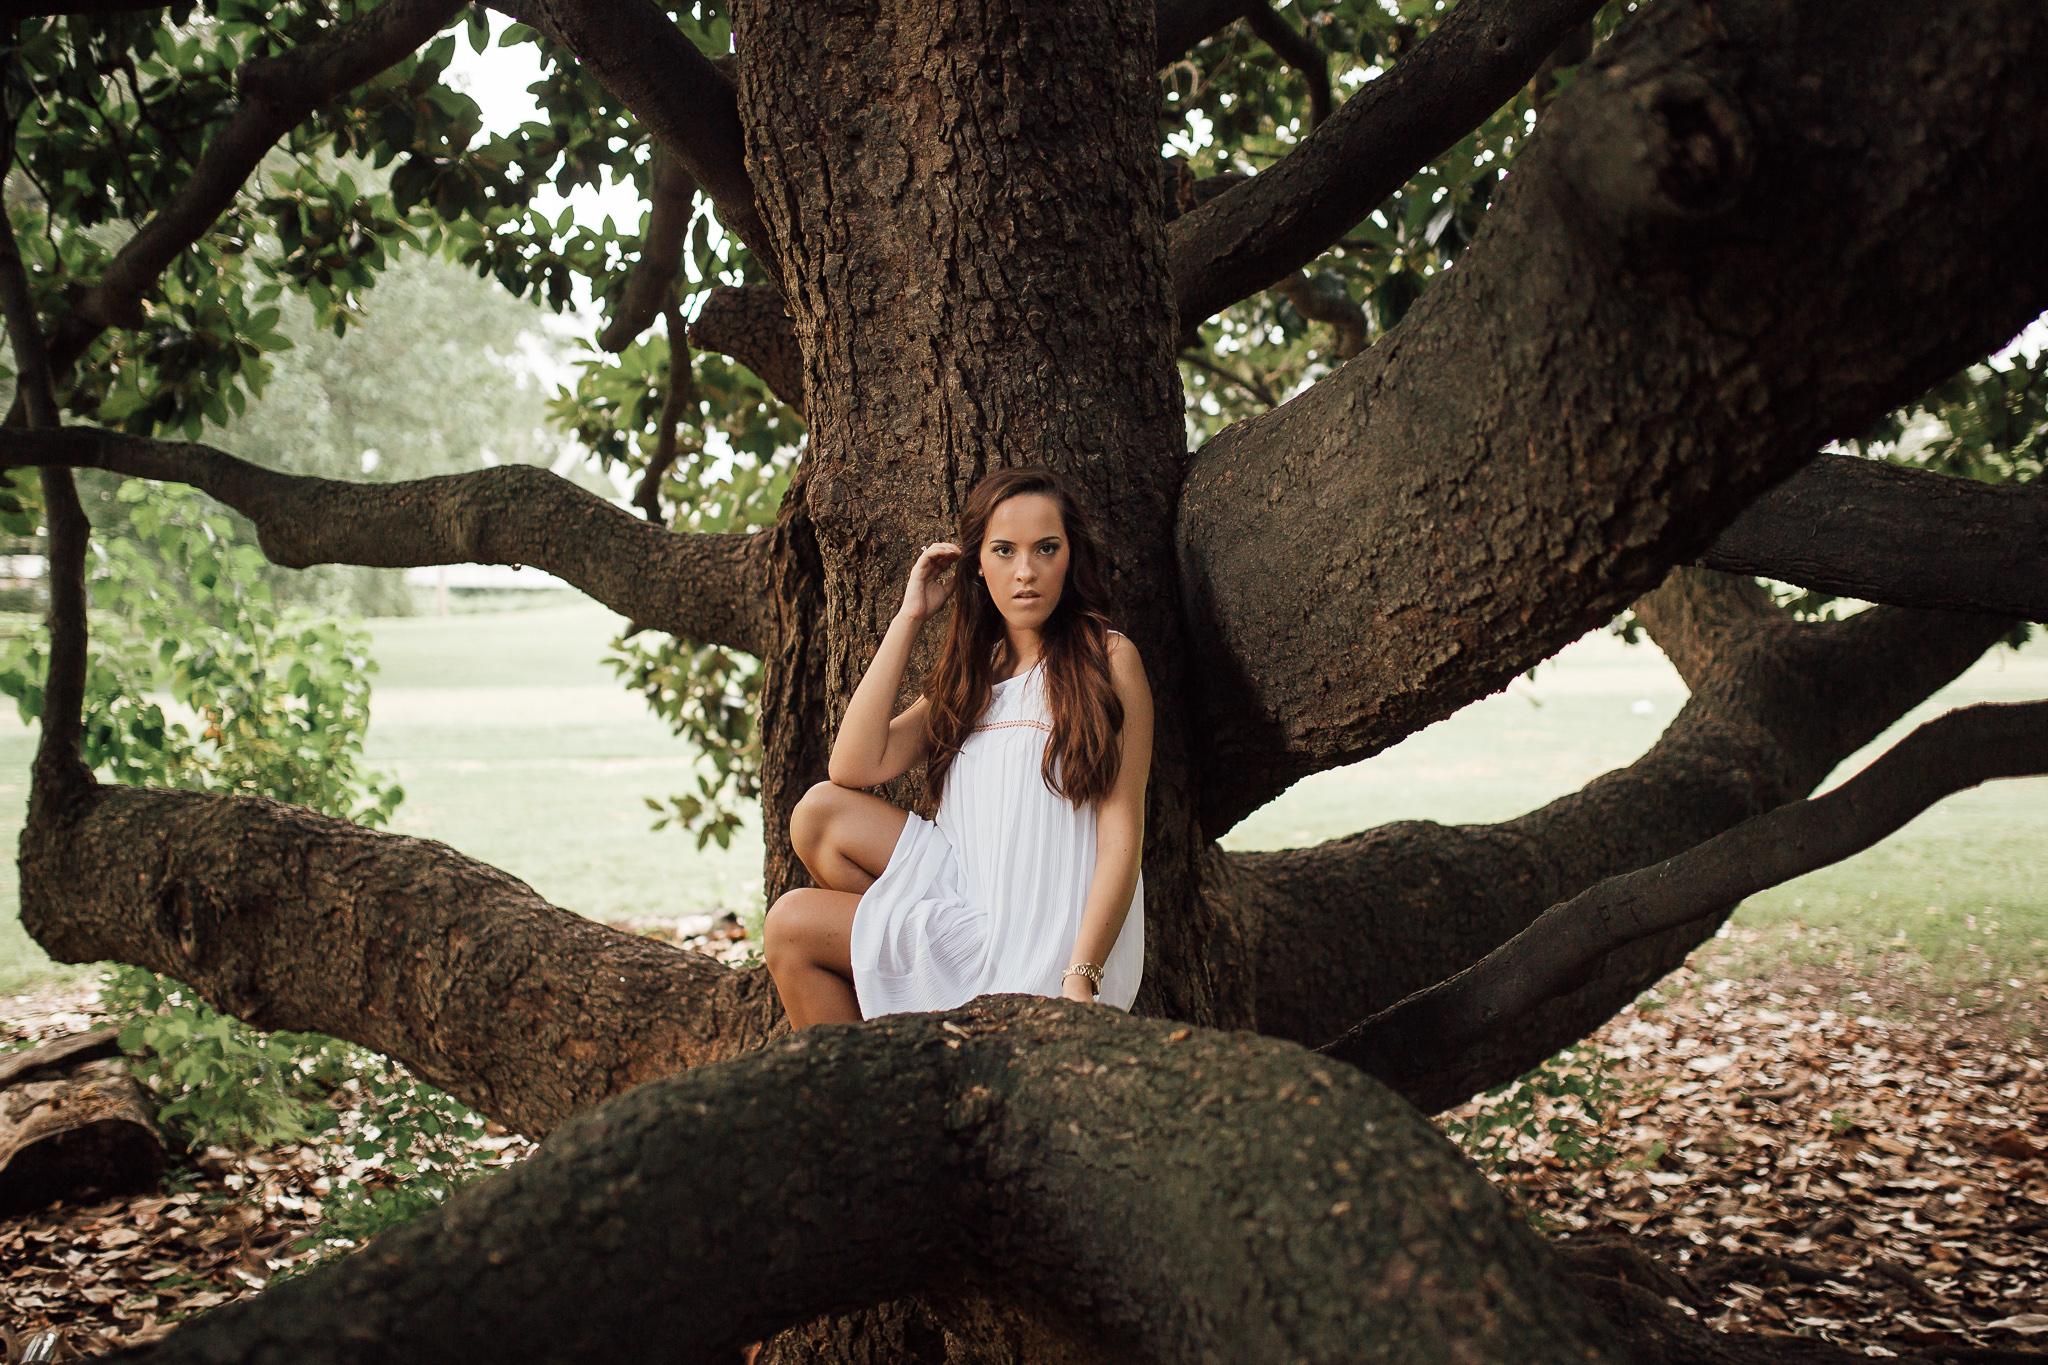 memphis-senior-photographer-hernando-ms-senior-downtown-senior-portraits